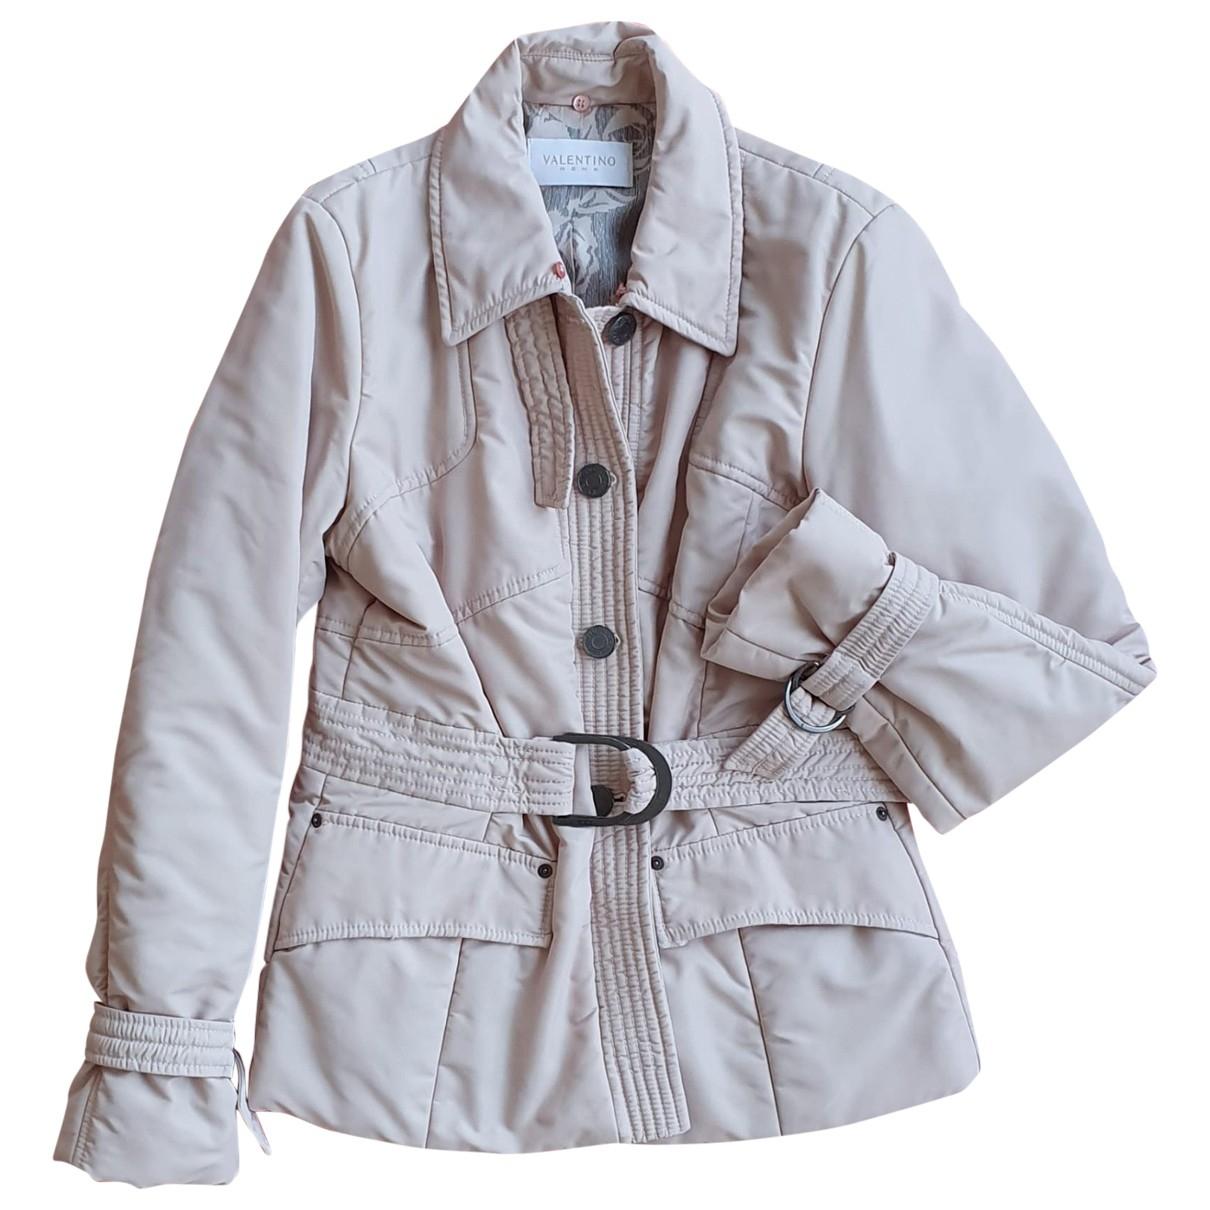 Valentino Garavani \N Beige coat for Women 46 IT